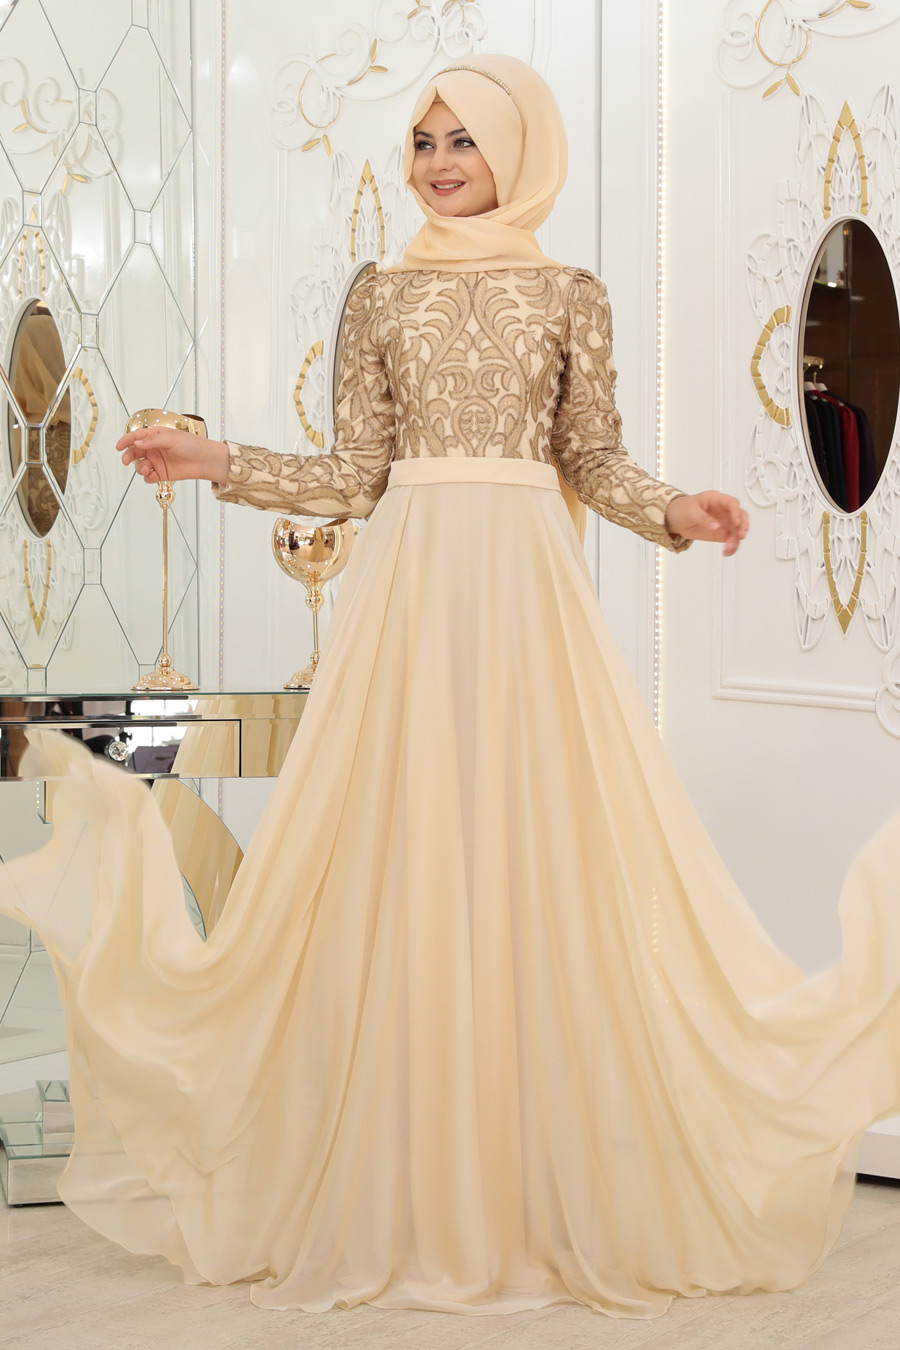 2570cd83d7402 Pınar Şems - Ecrin Abiye - Gold